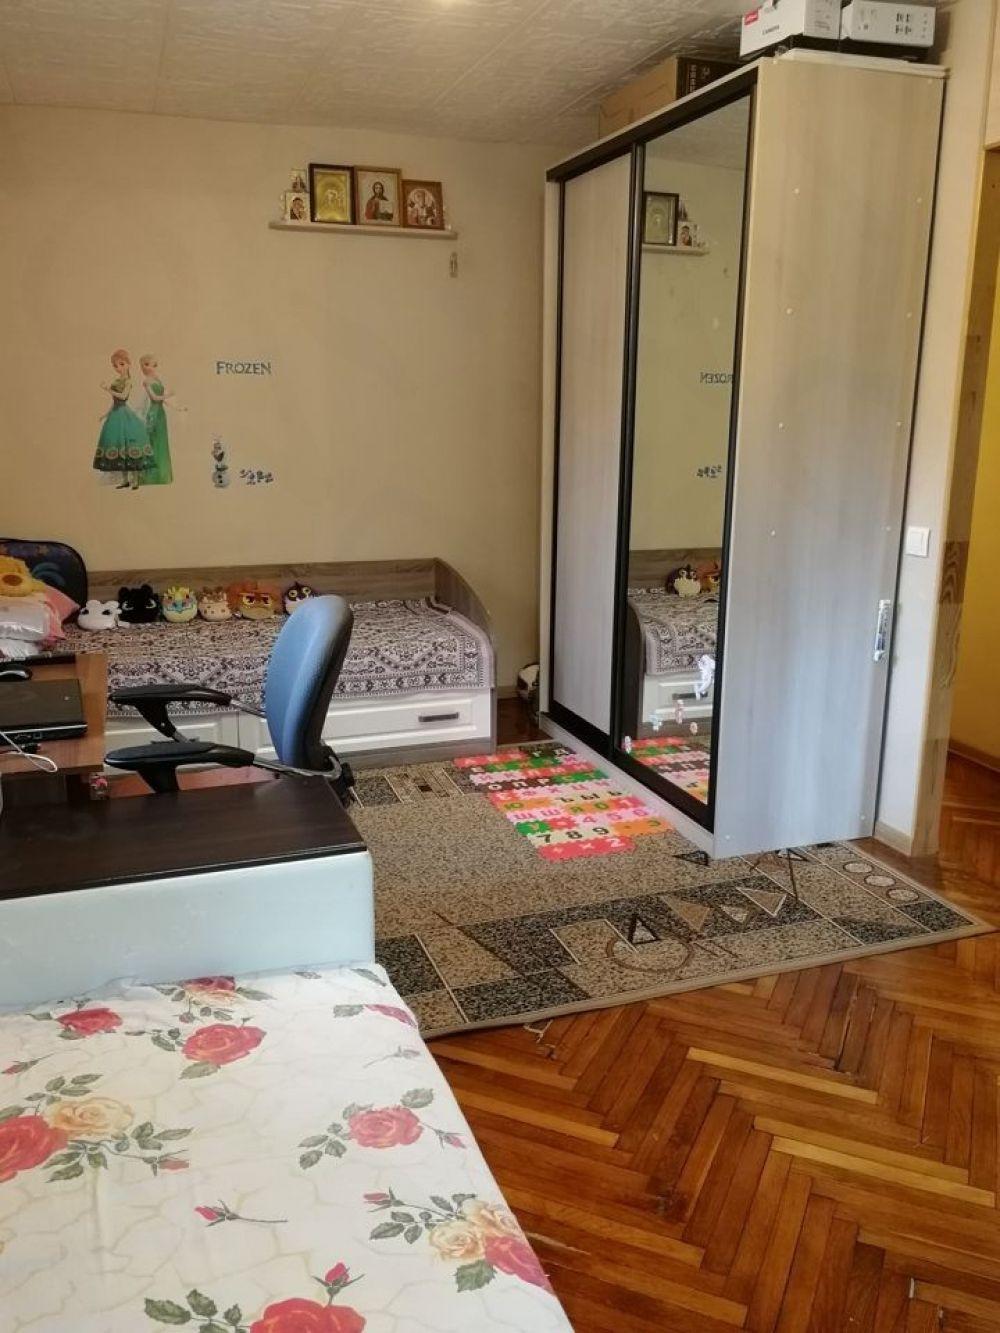 1-к квартира, Щёлково, Парковая улица, 5А, фото 12